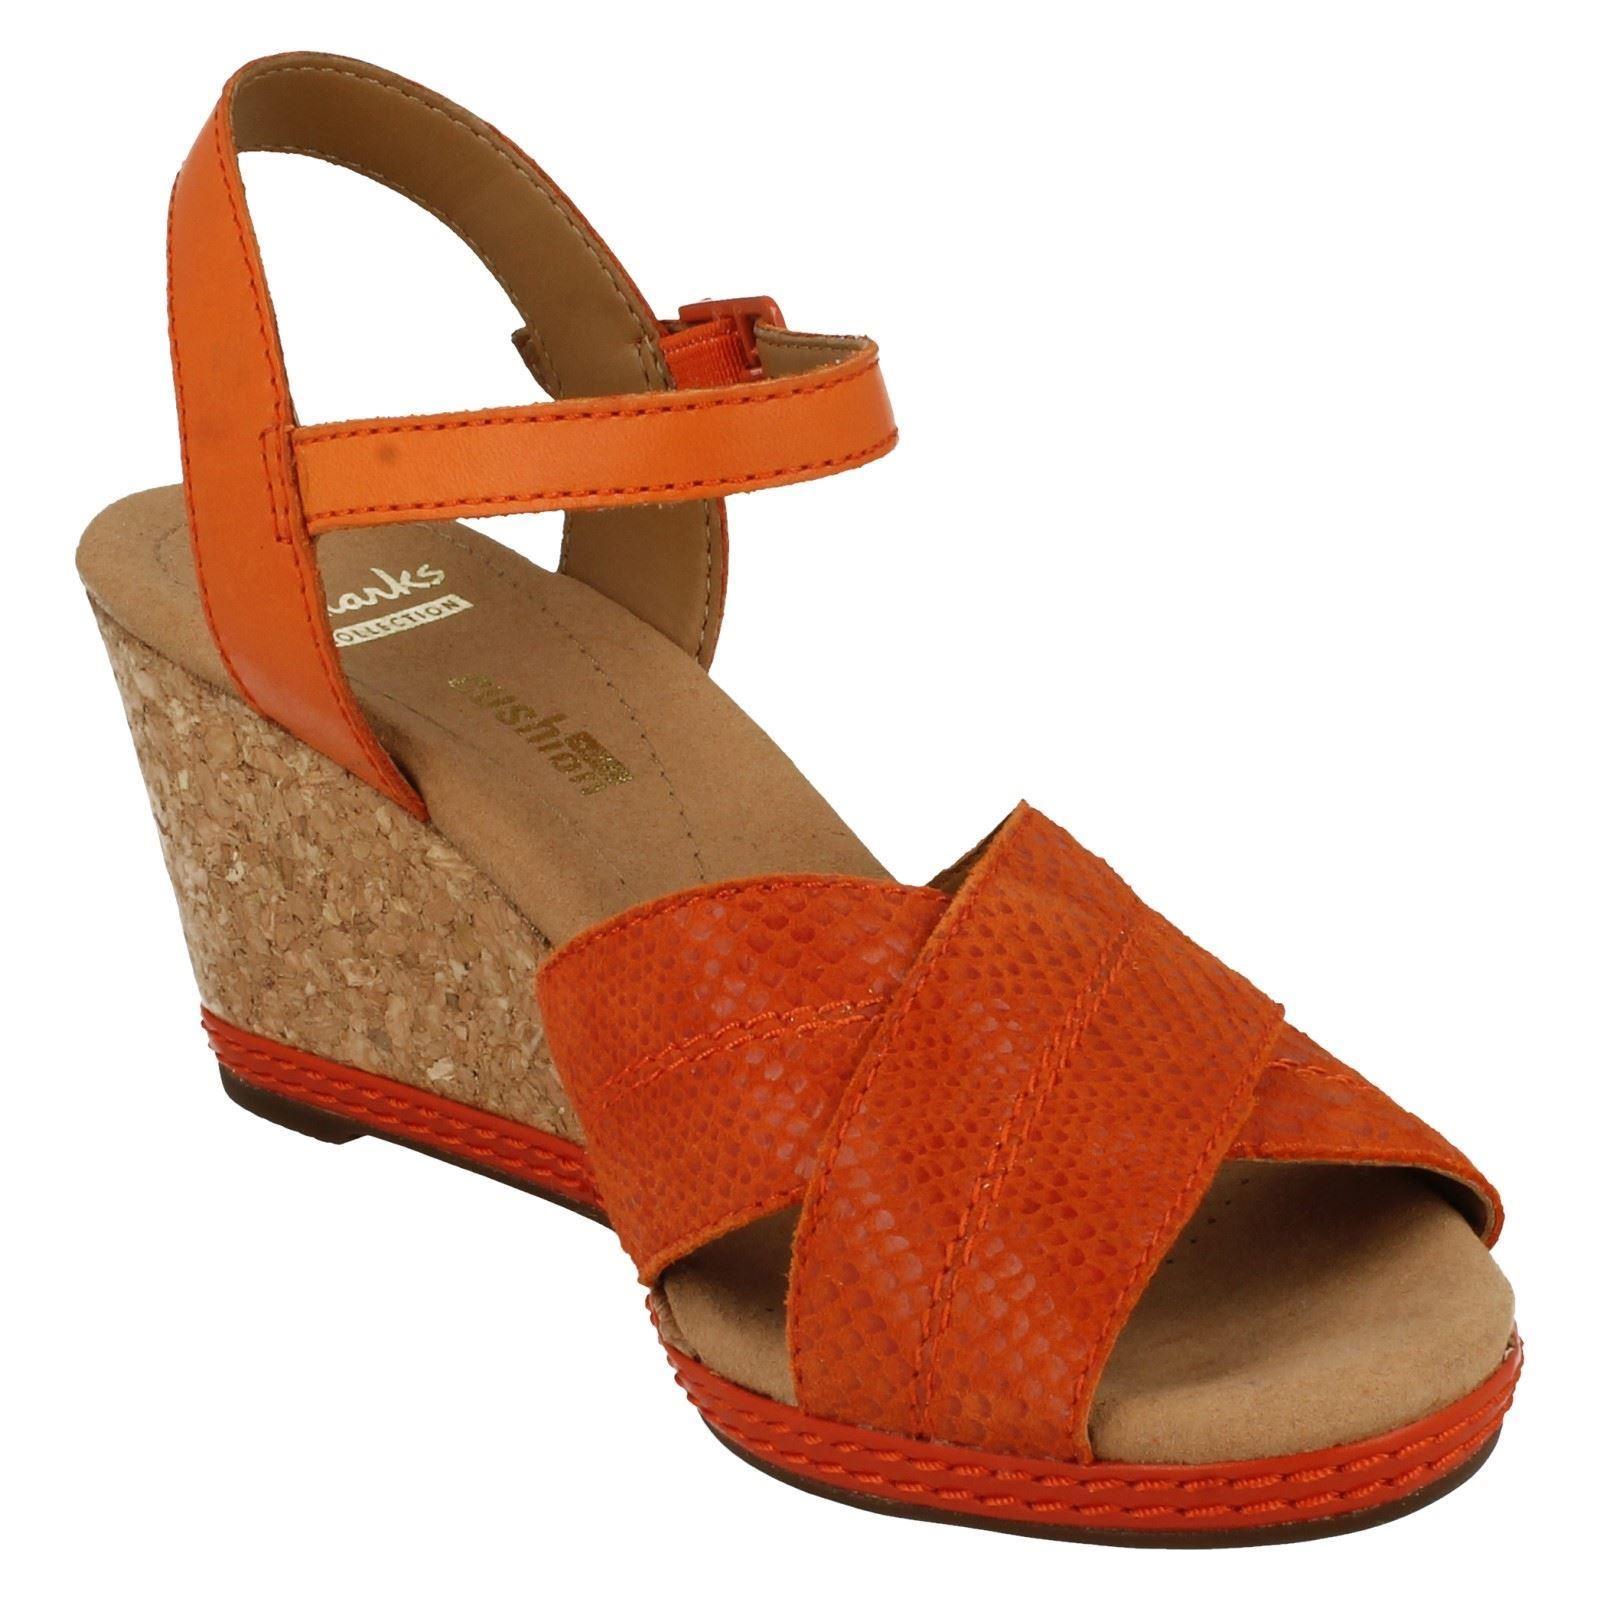 Ladies Clarks Open Toe Wedge Sandals /'Helio Latitude/'